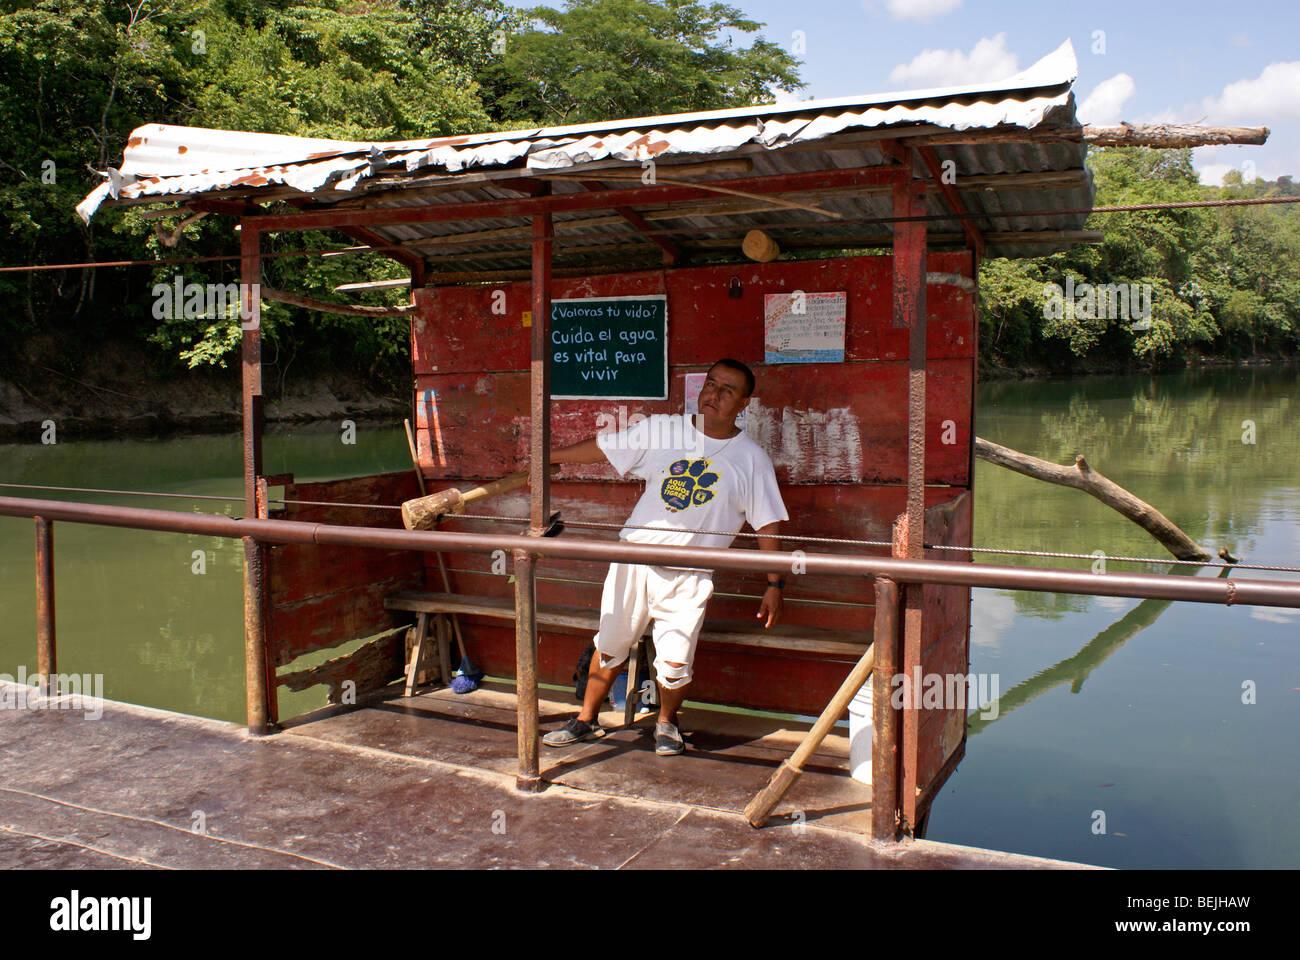 Hand operated river ferry operator near the town of Axtla de Terrazas, Huasteca region, San Luis Potosi state, Mexico - Stock Image